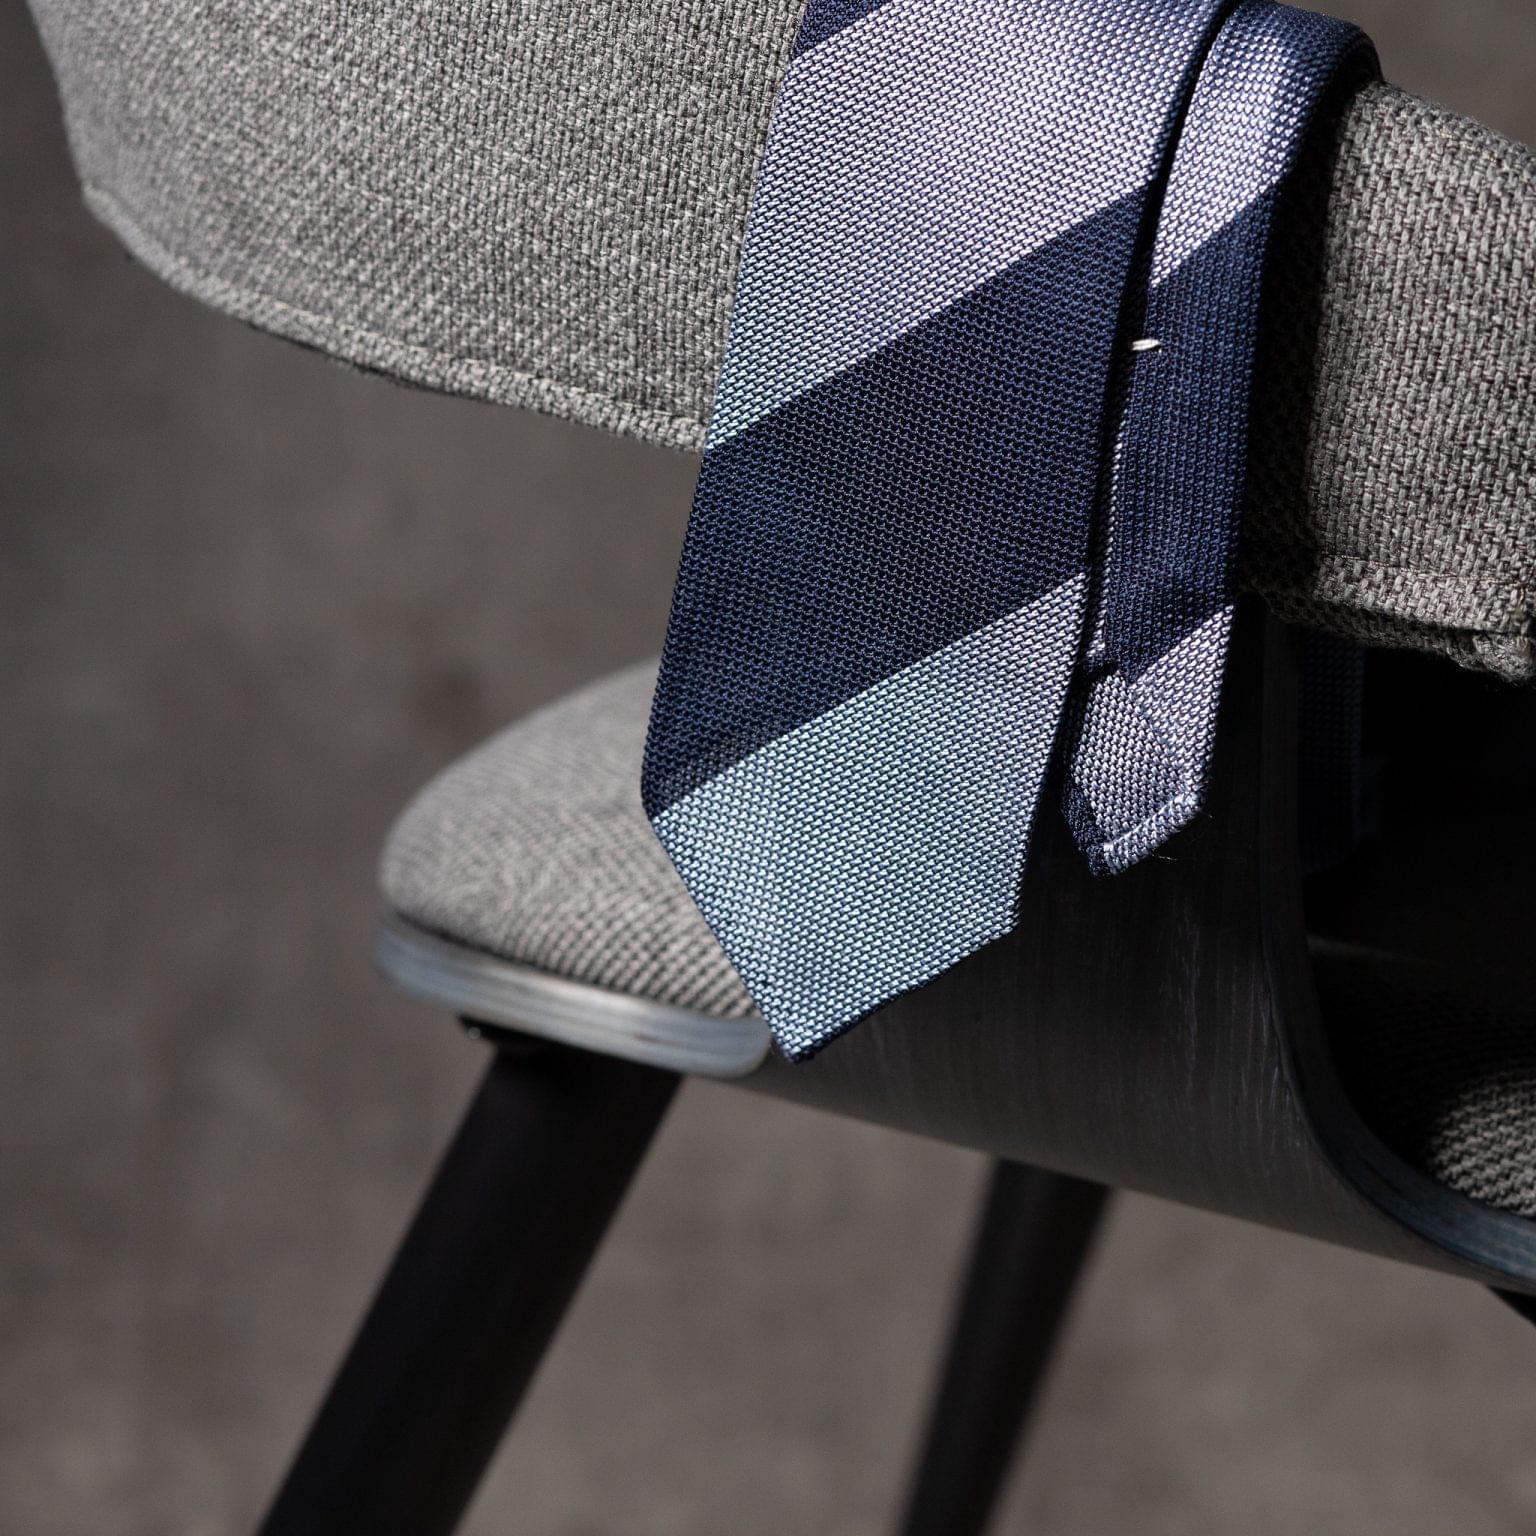 GRENADINE-0522-Tie-Initials-Corbata-Iniciales-The-Seelk-2